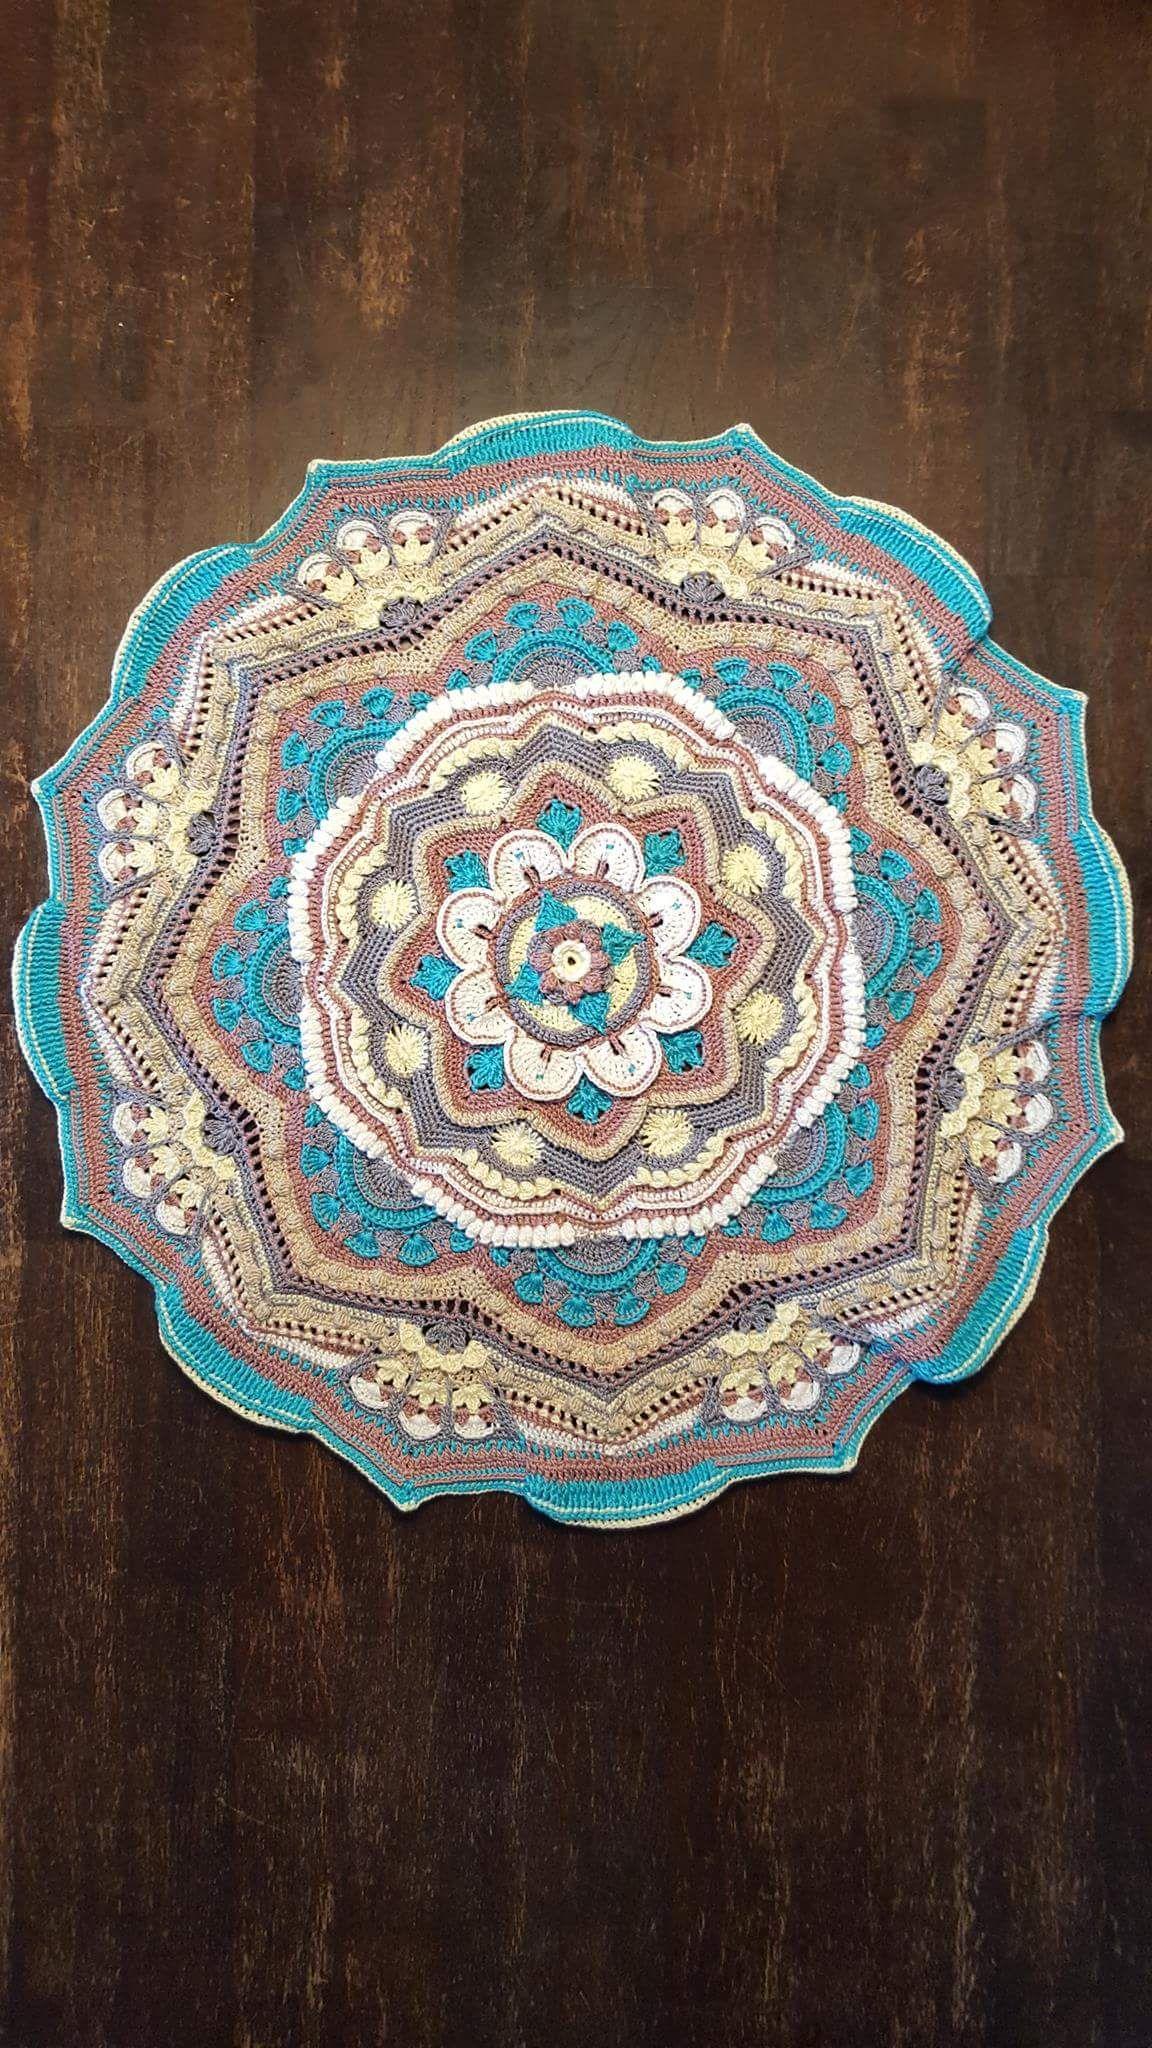 Pin de Carolynn Dowlen en Mandala Madness! | Pinterest